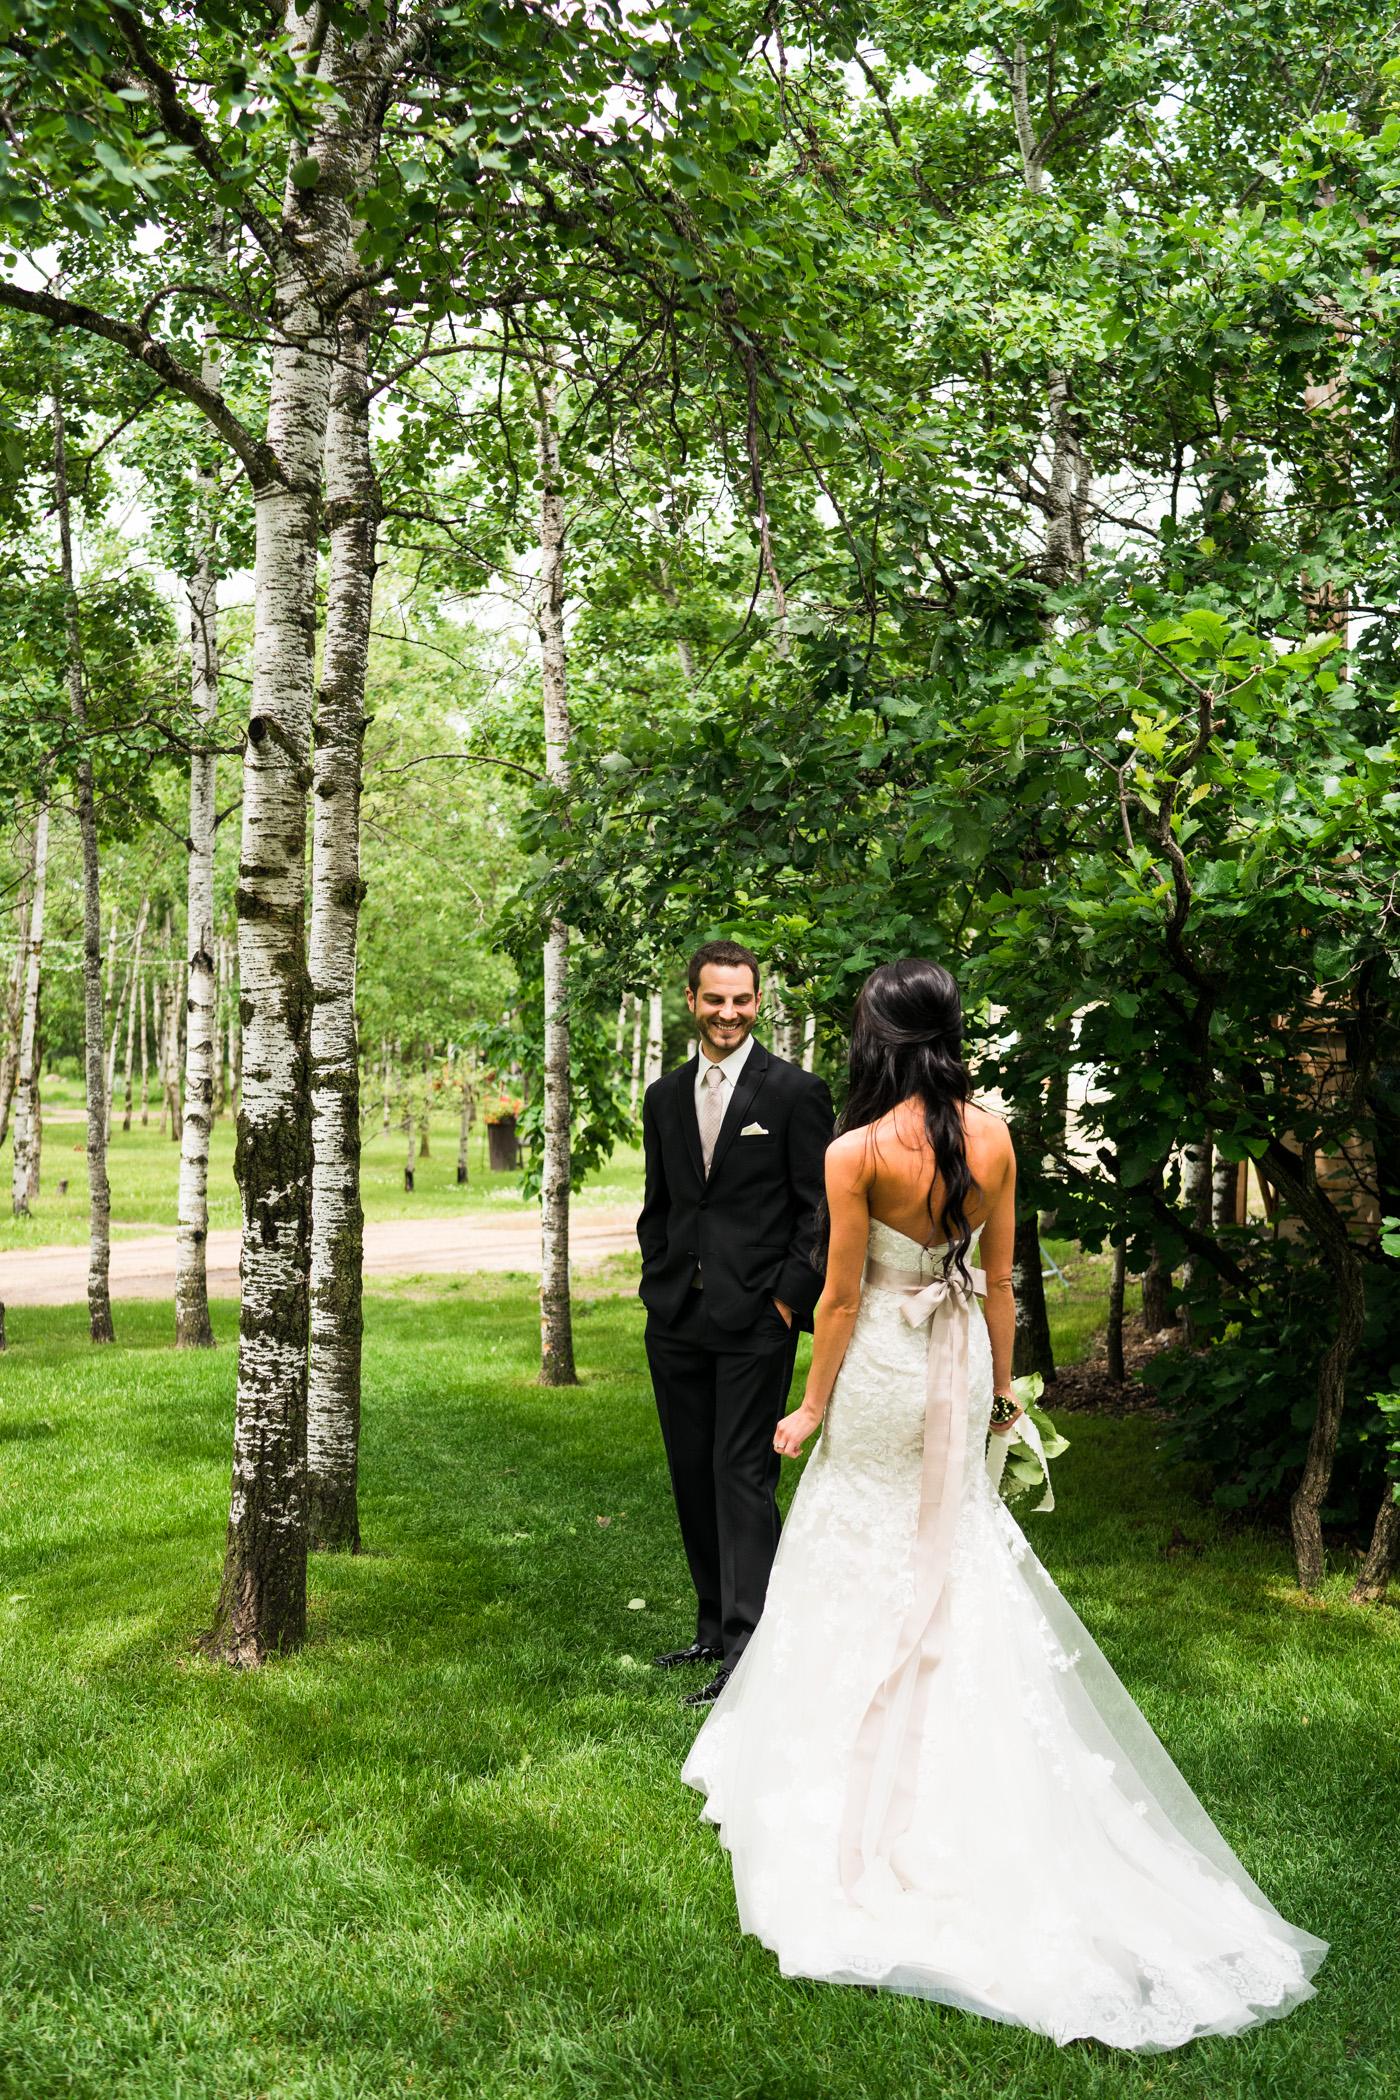 Hillary and Mark - Pineridge Hollow Wedding - Cojo Photo-256.jpg